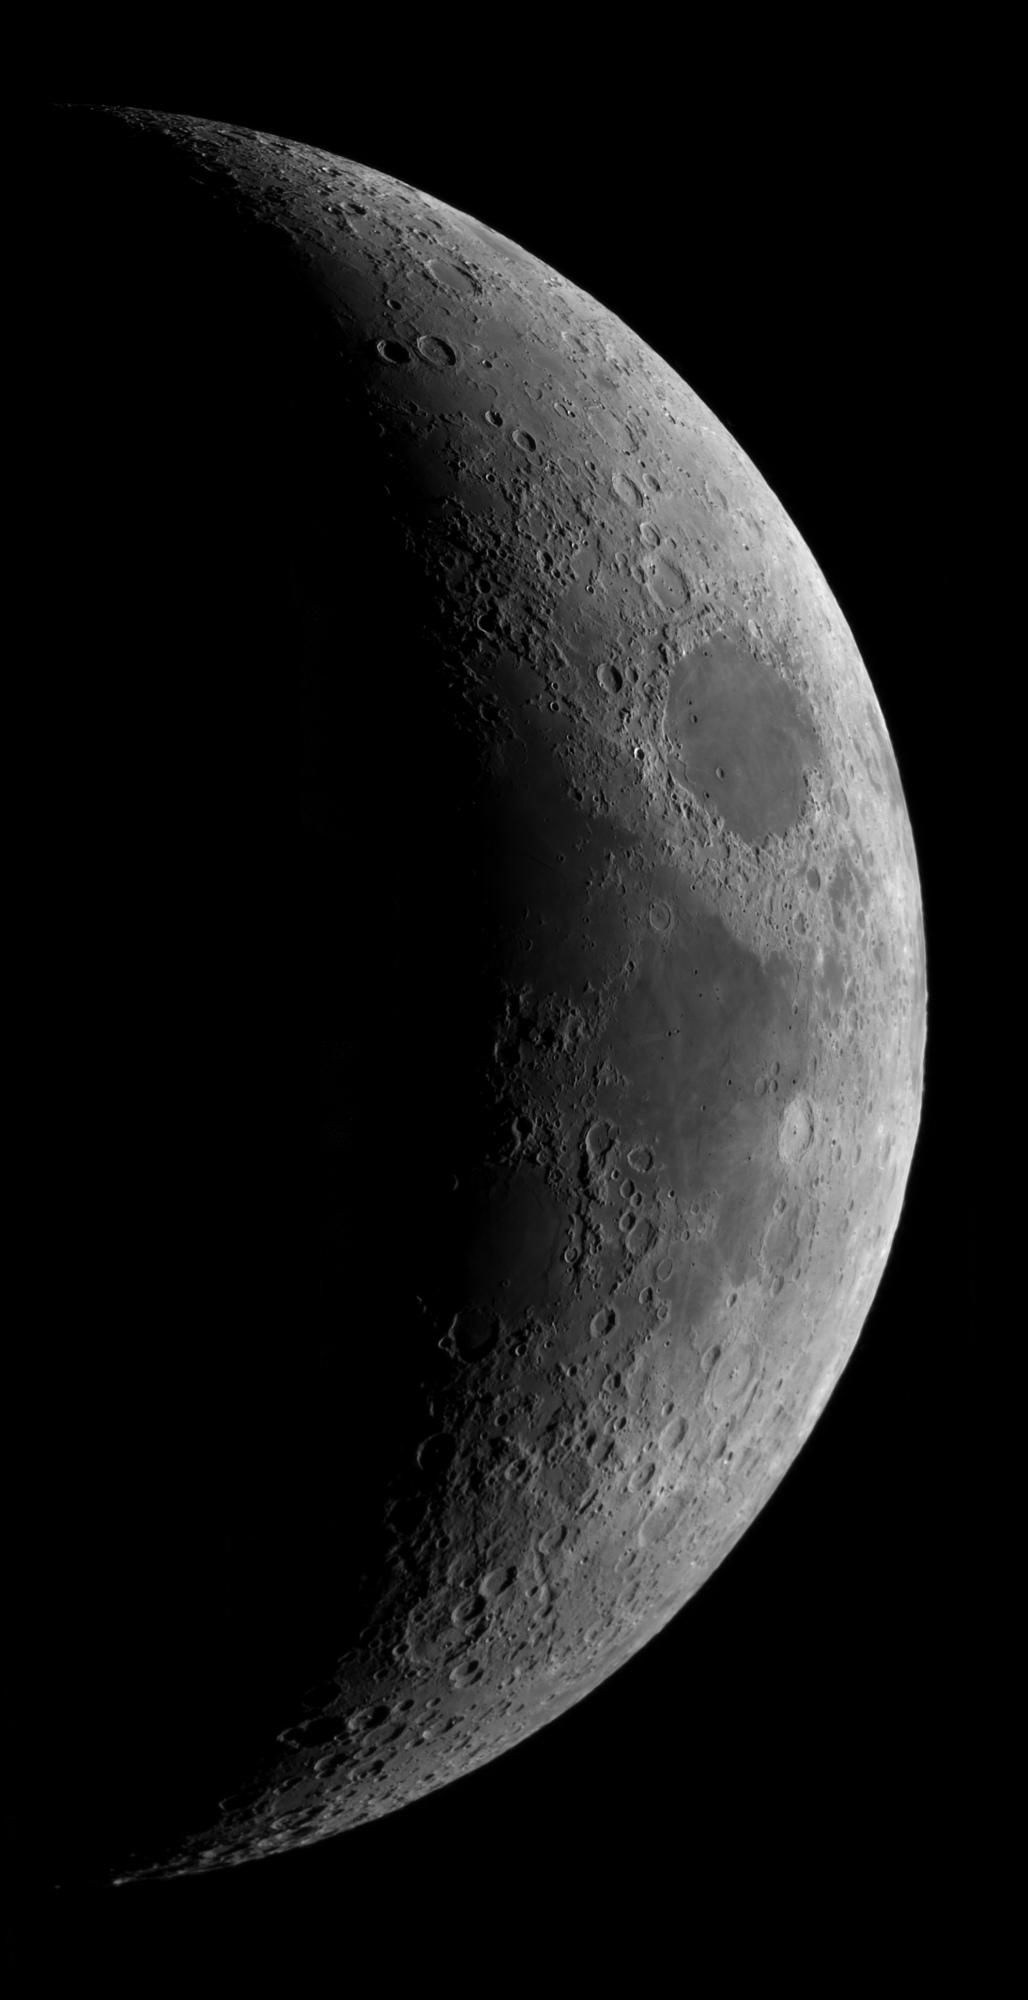 5b020e1349a78_lune(c8-70).thumb.jpg.3b5d47f71c35a7d8061ea6dd52fc543e.jpg